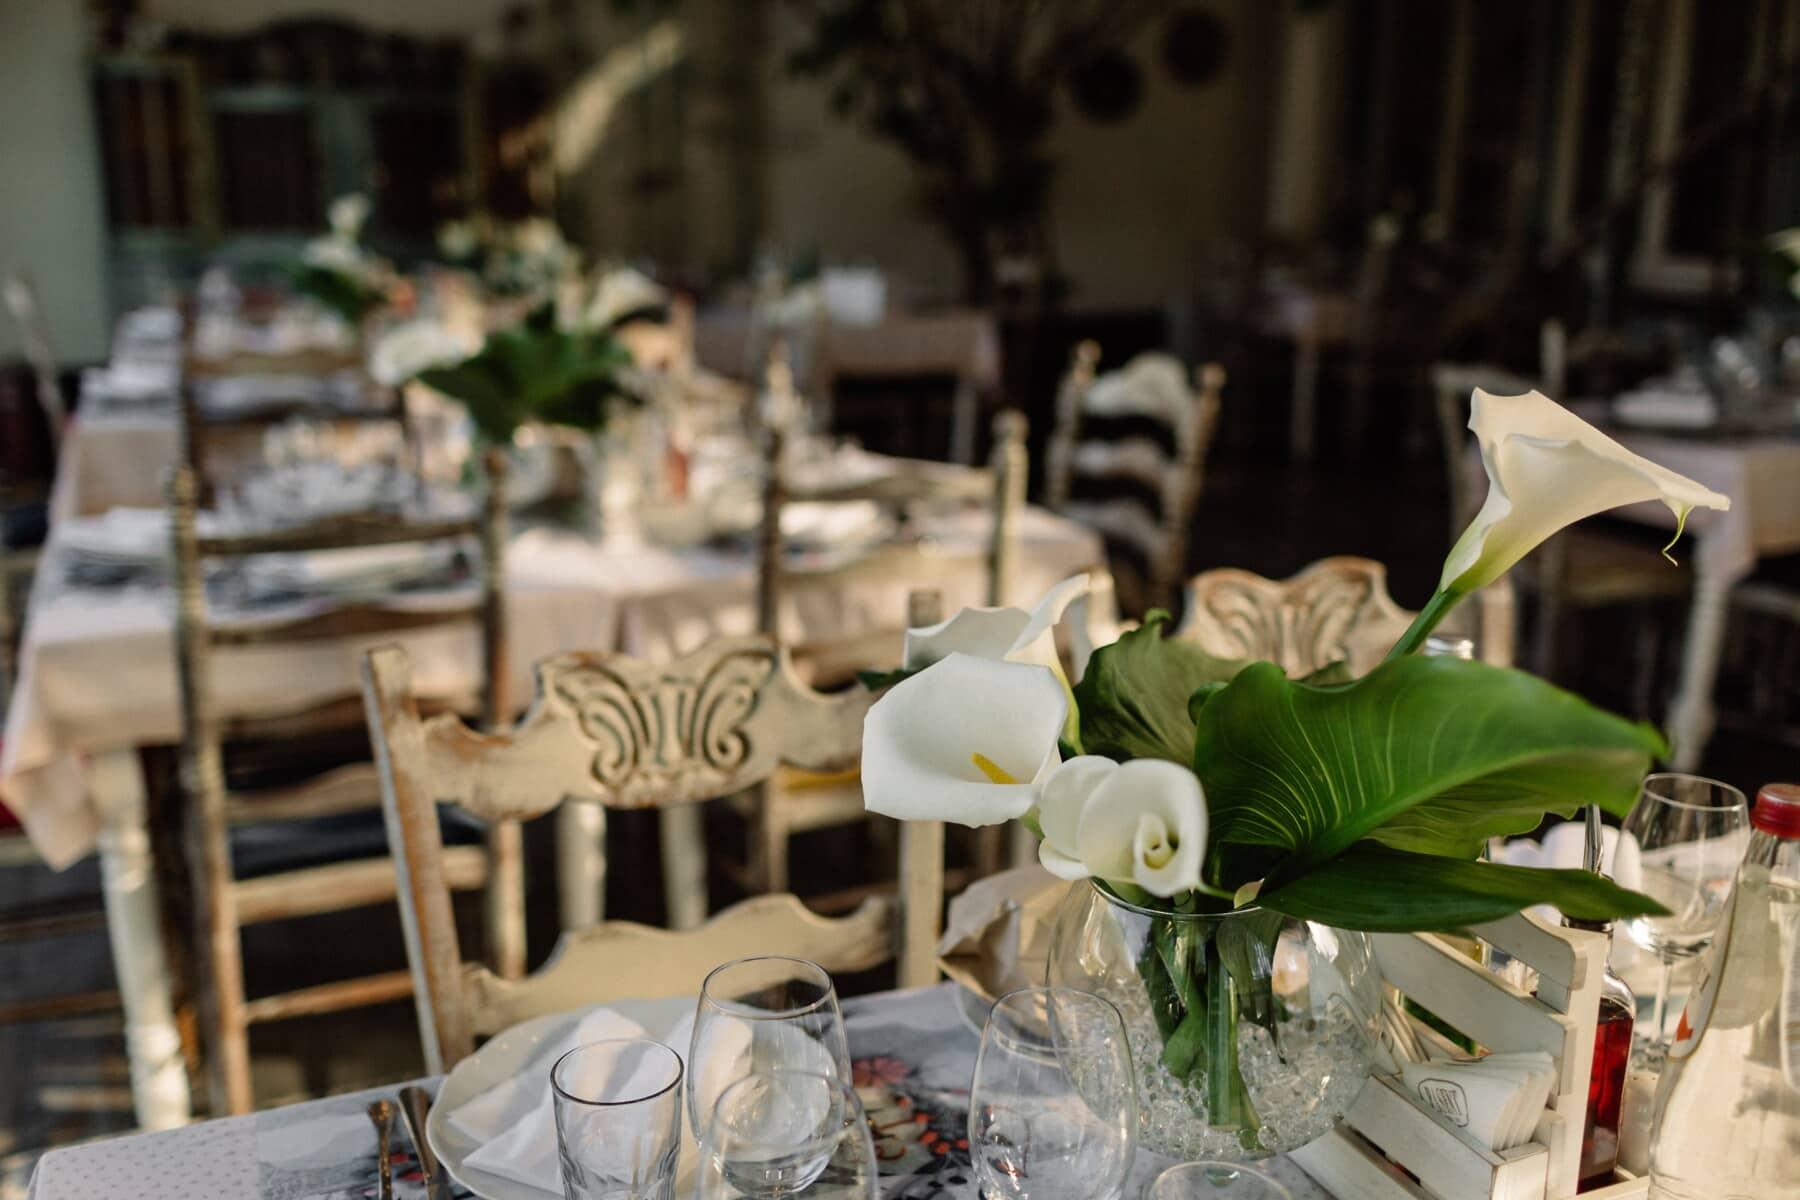 cutlery, dinner, table, restaurant, dining, hotel, tableware, silverware, chair, interior design